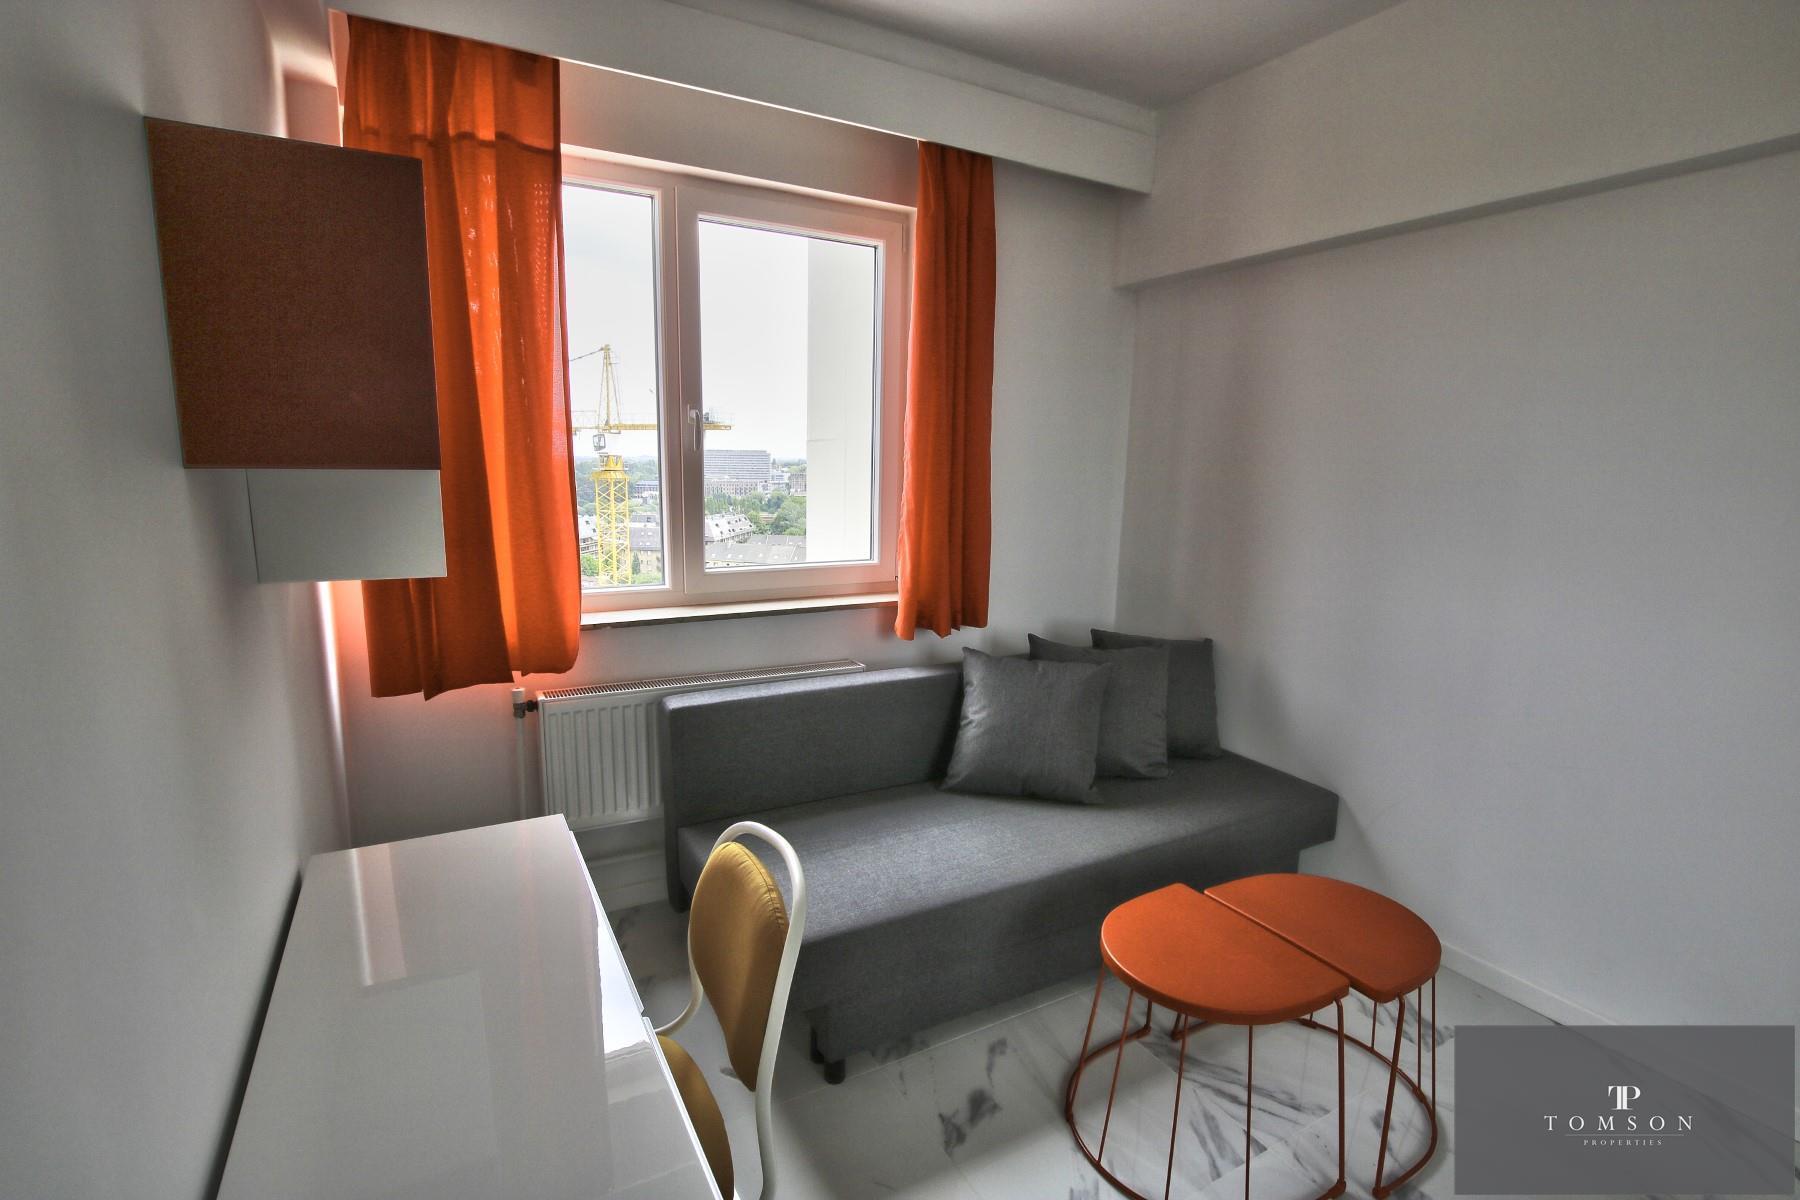 Appartement - Woluwe-Saint-Lambert - #4115211-6